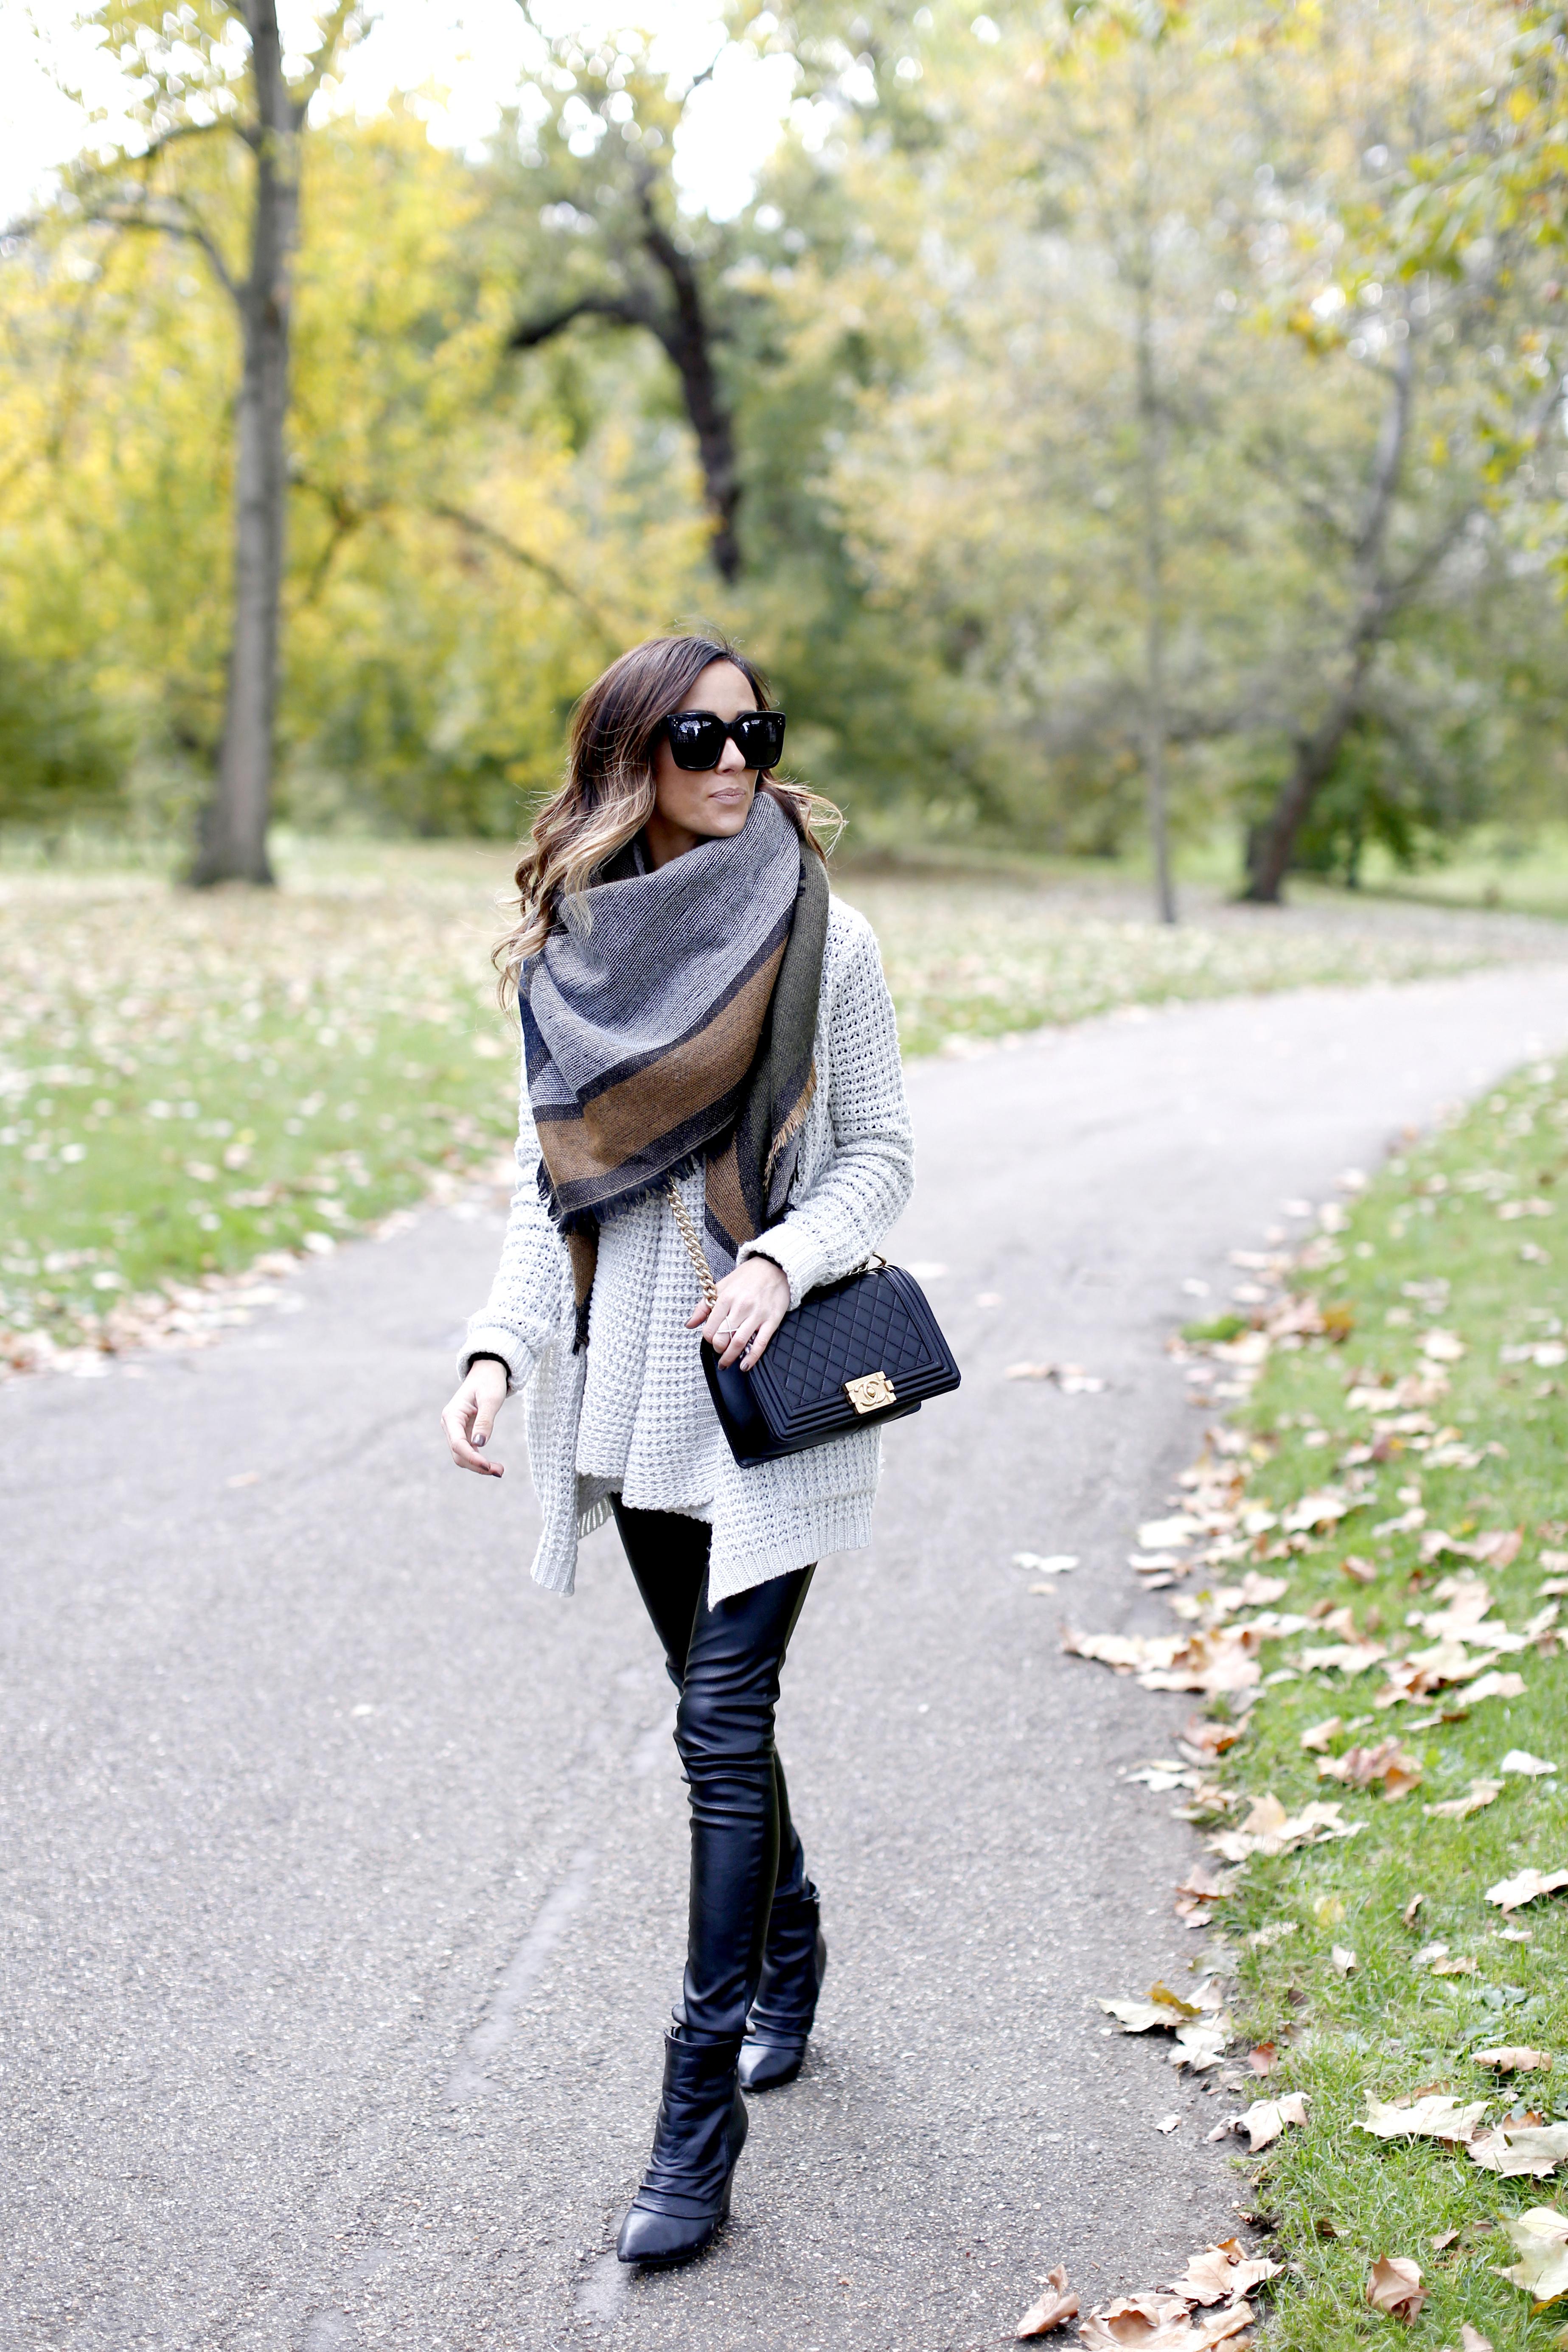 london packing list, fall trip